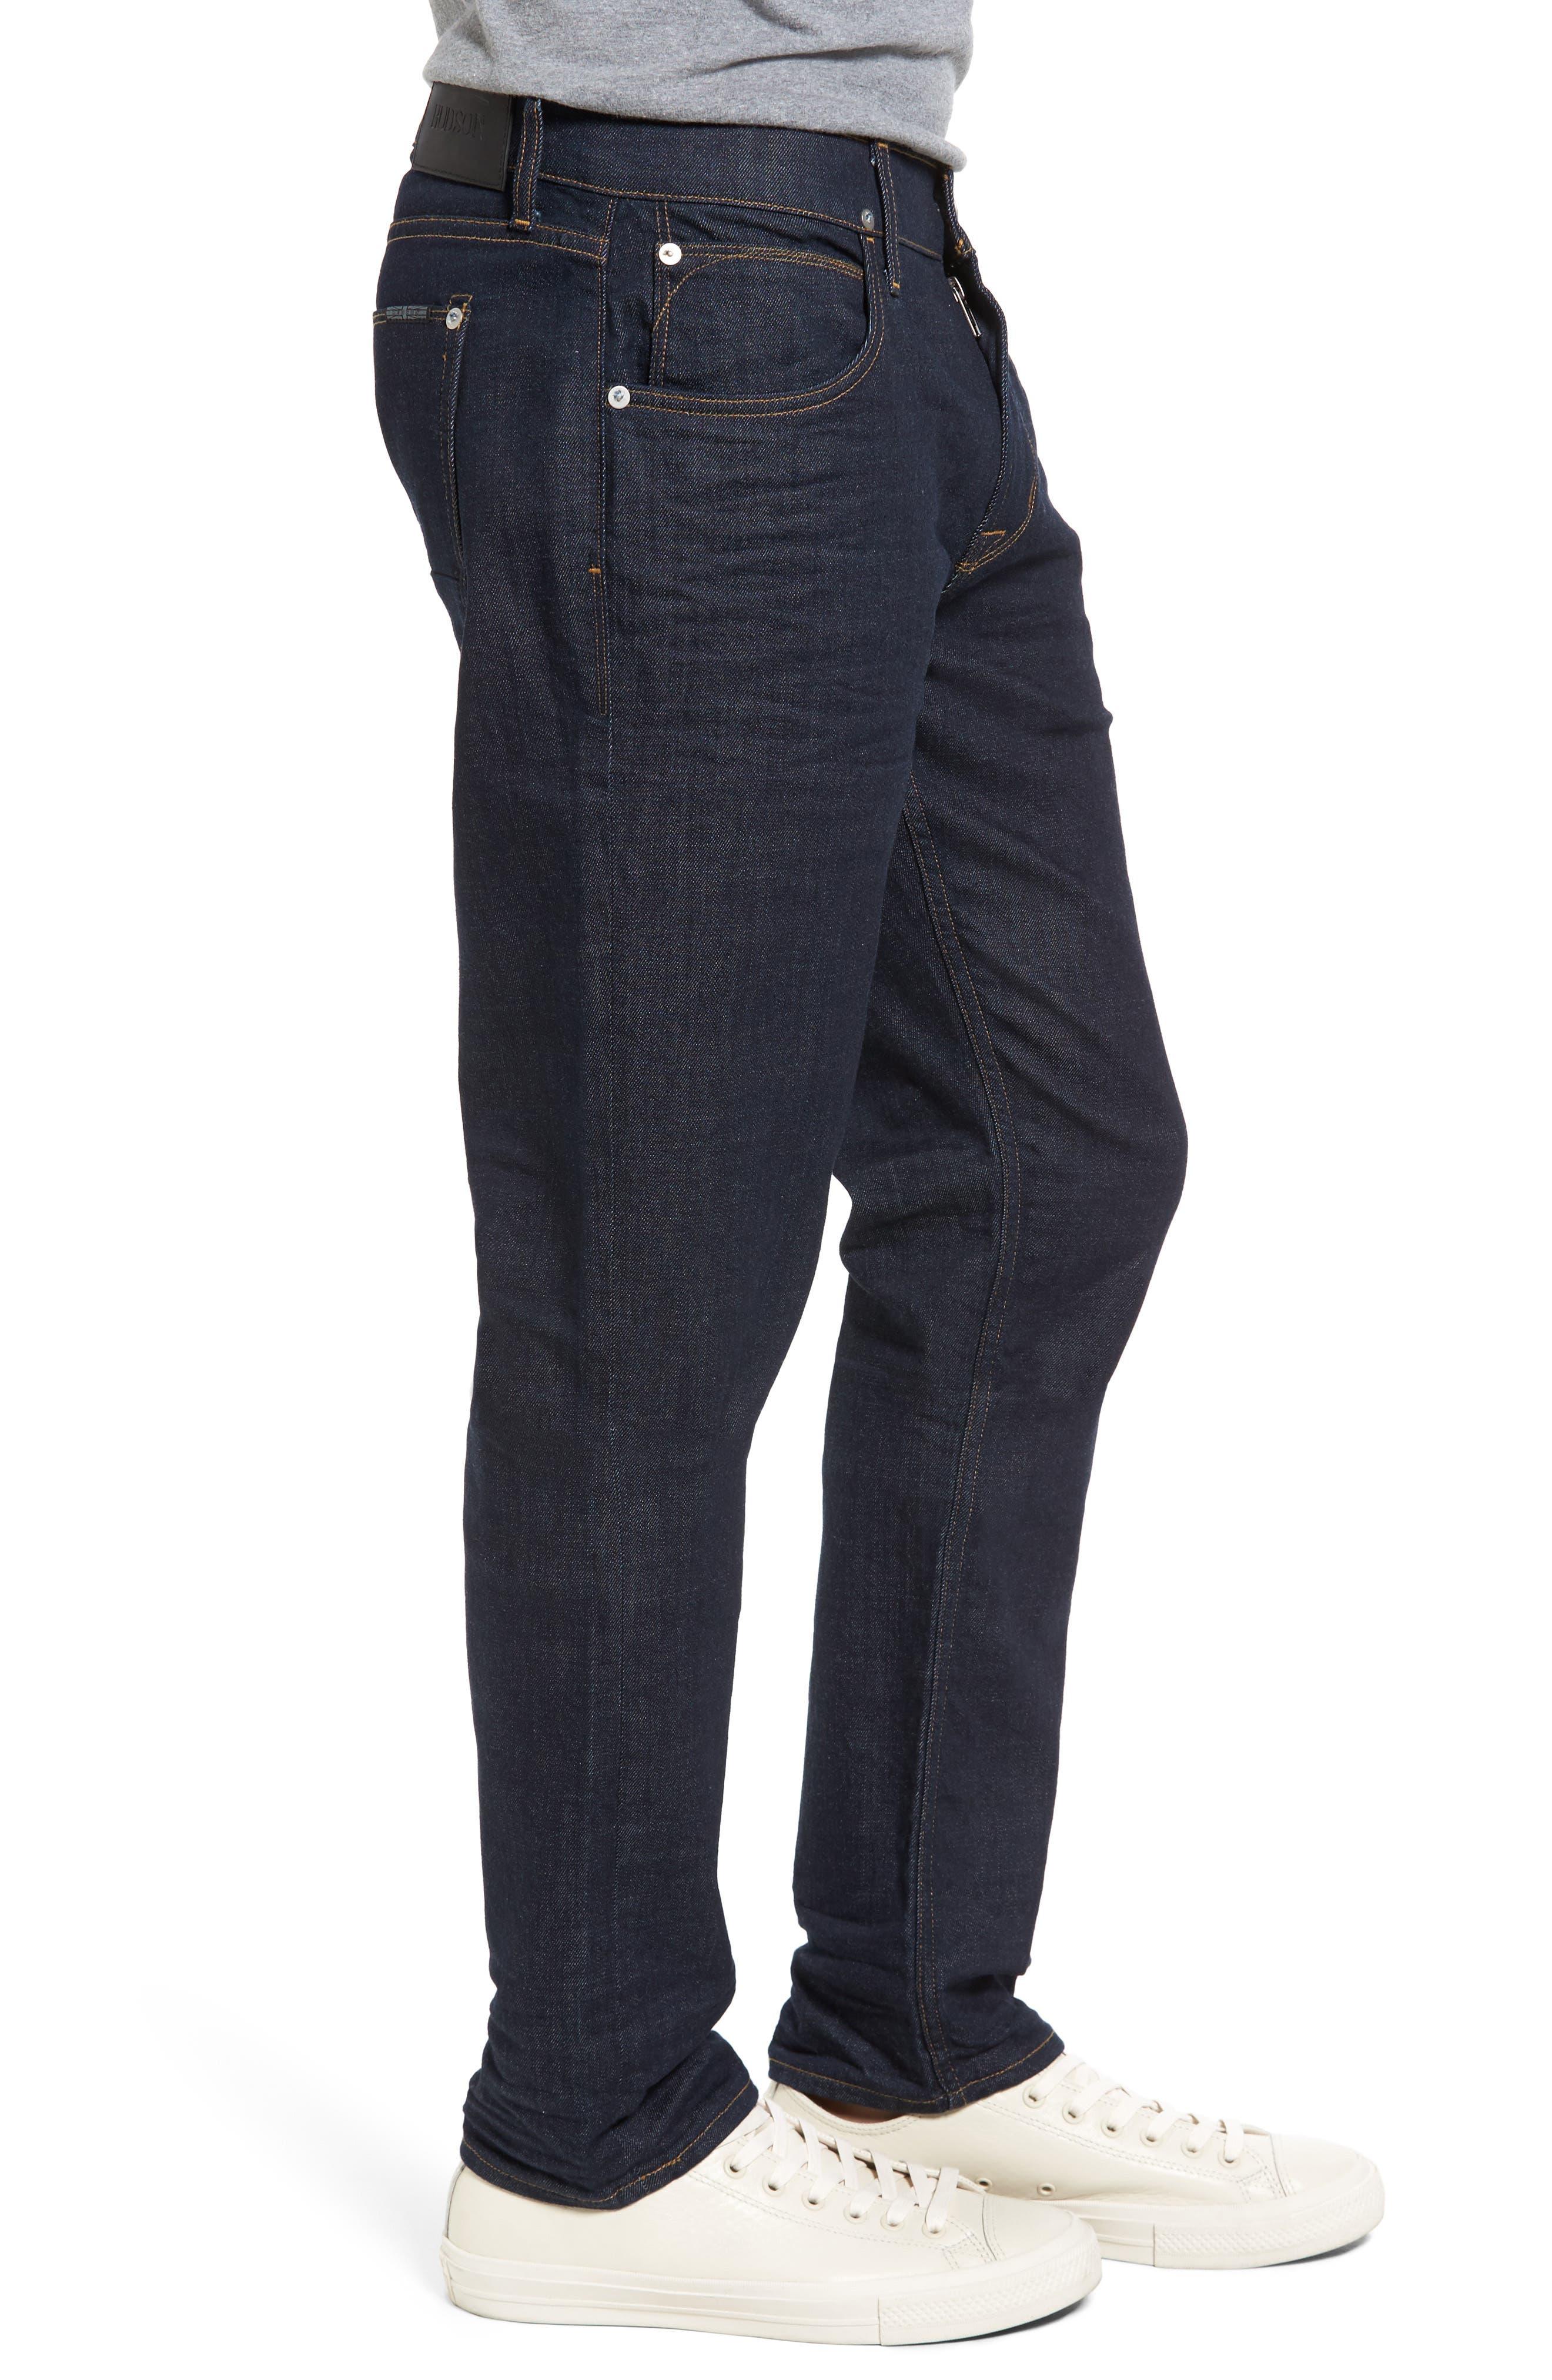 Blake Slim Fit Jeans,                             Alternate thumbnail 3, color,                             410